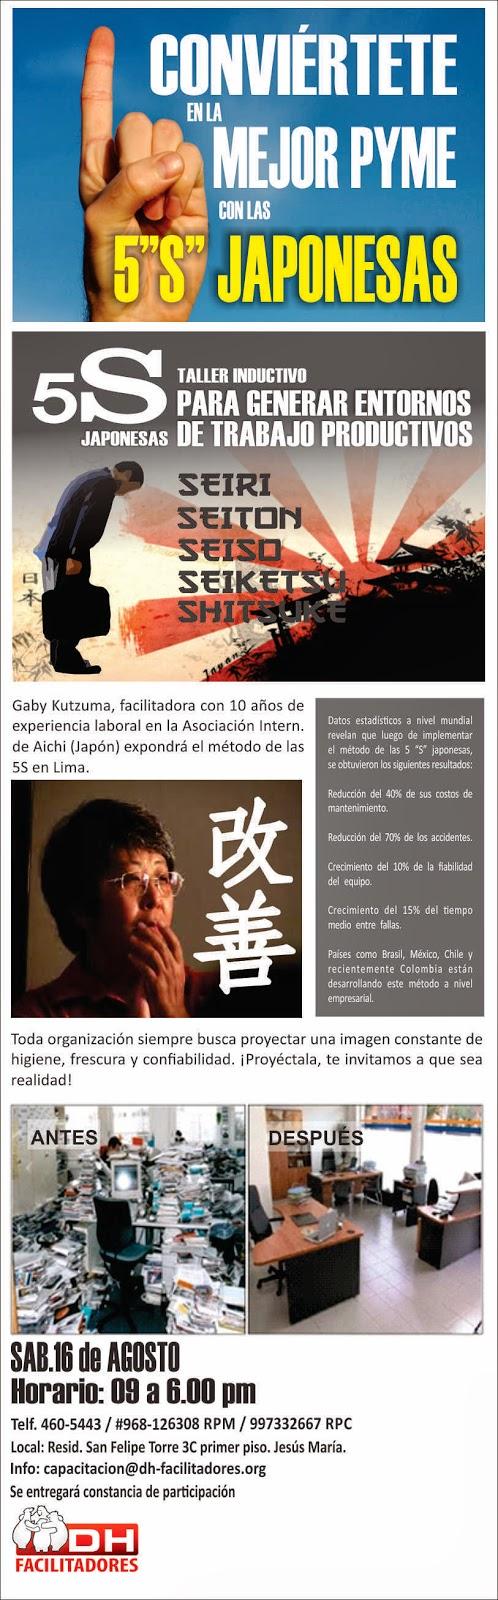 http://www.dh-facilitadores.org/index.php?option=com_content&view=article&id=5537:las-5-qsq-japonesas-para-generar-entornos-de-trabajo-productivos&catid=40:dh-facilitadores&Itemid=78